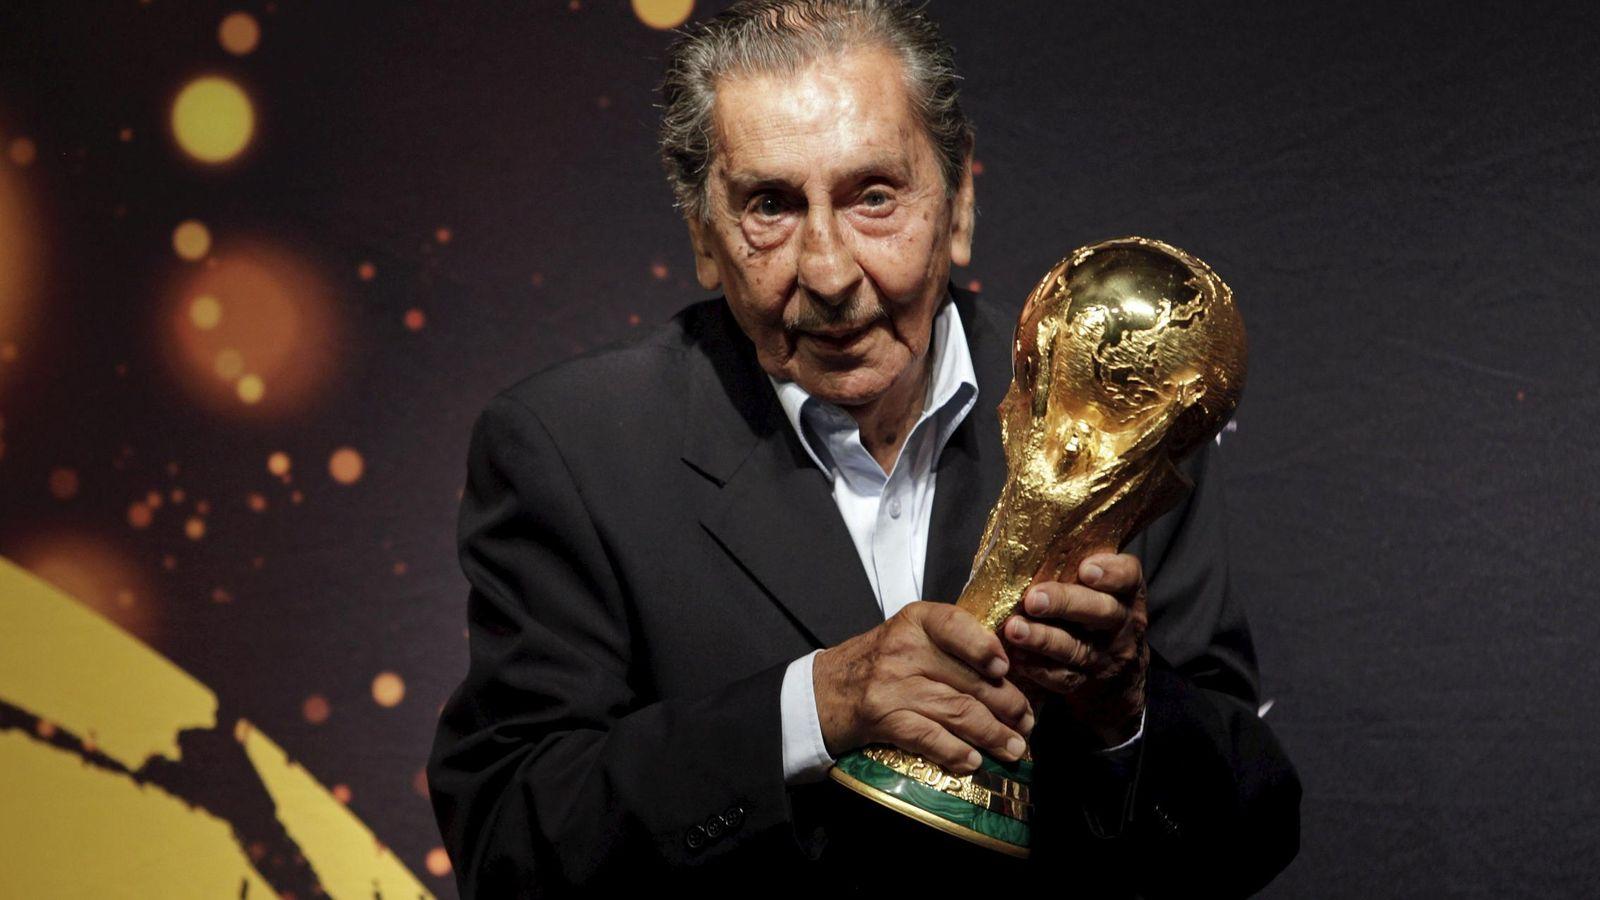 Foto: Alcides Ghiggia en una foto de archivo (Reuters).